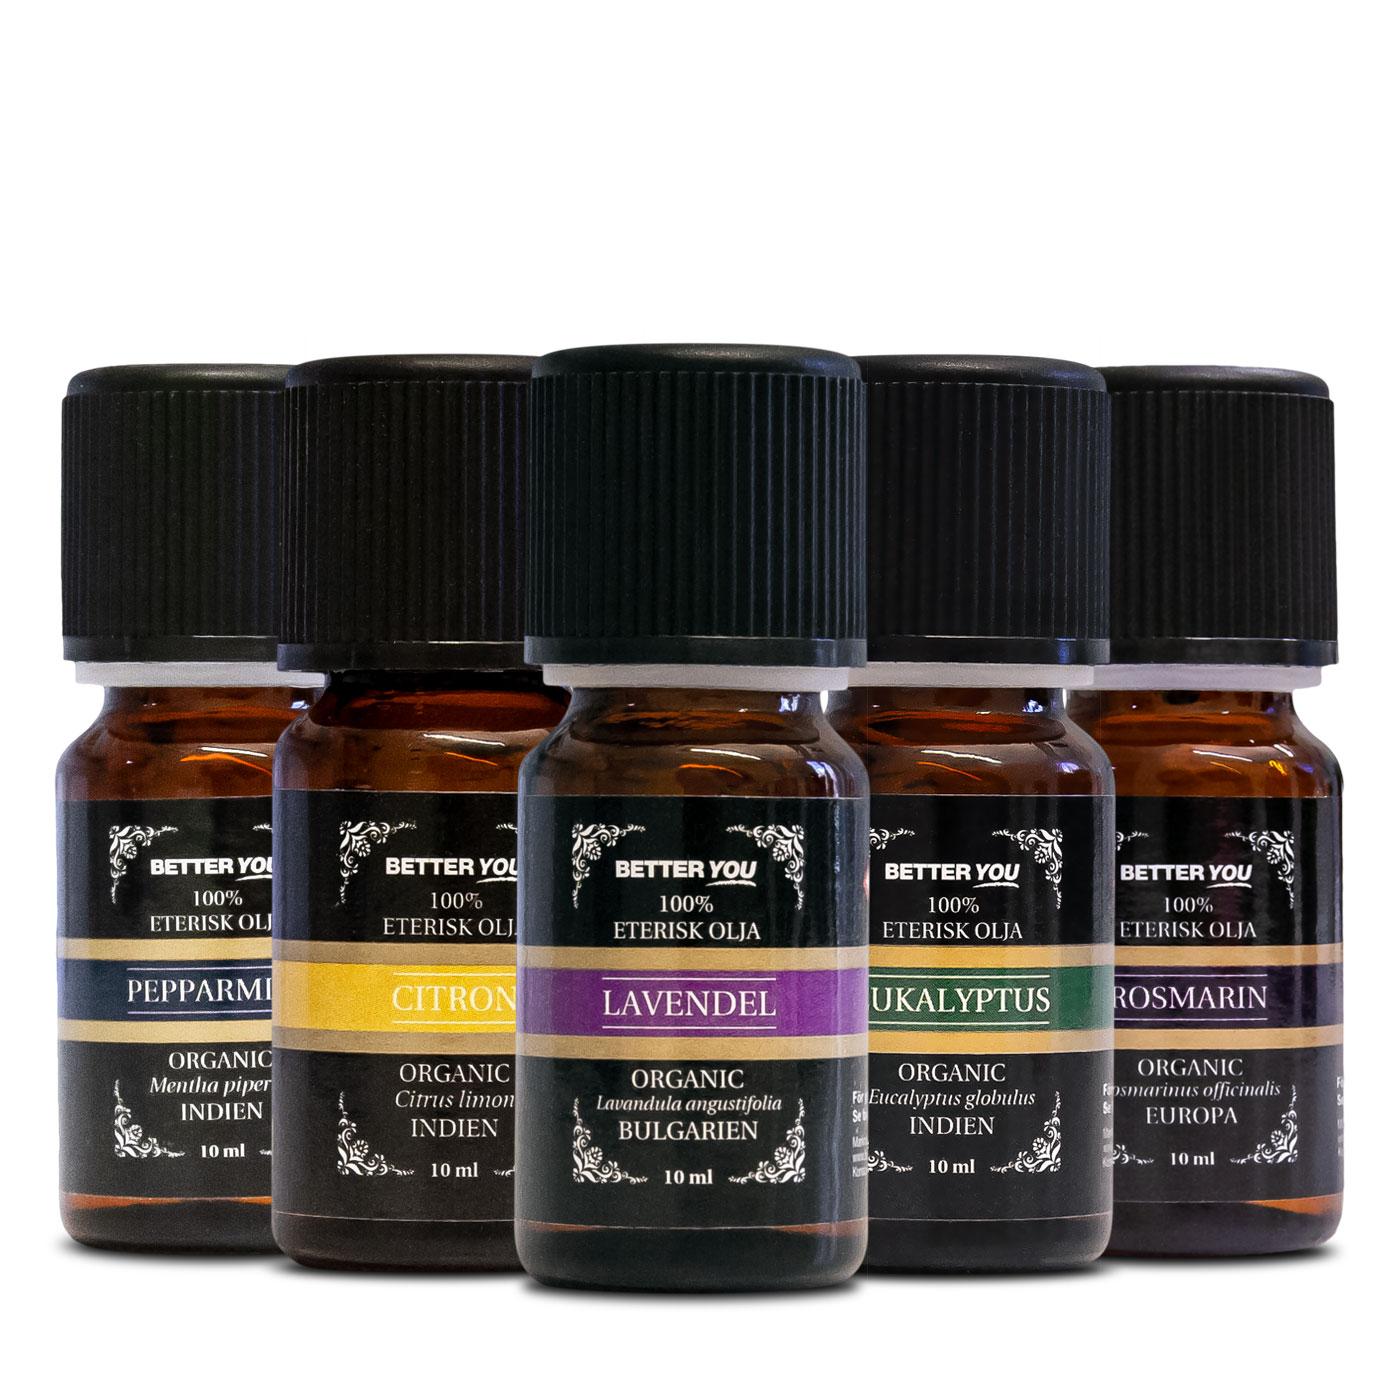 Aromaterapi paket - Oljor